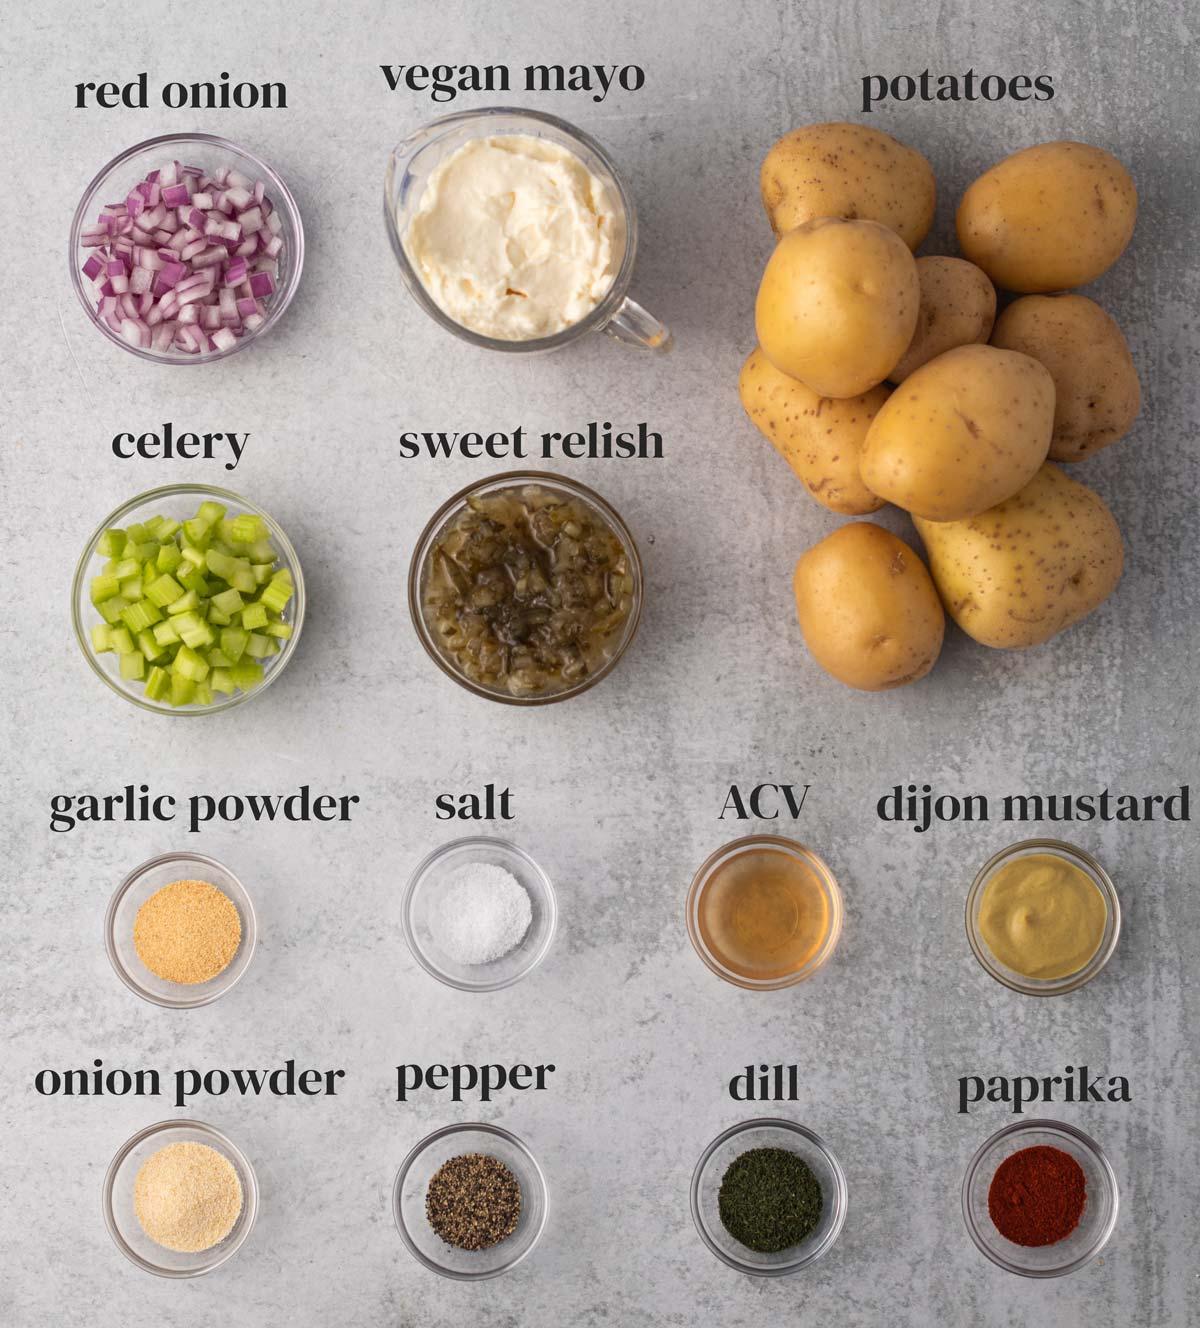 ingredients for potato salad with vegan mayo, celery, onions, seasonings and dijon mustard